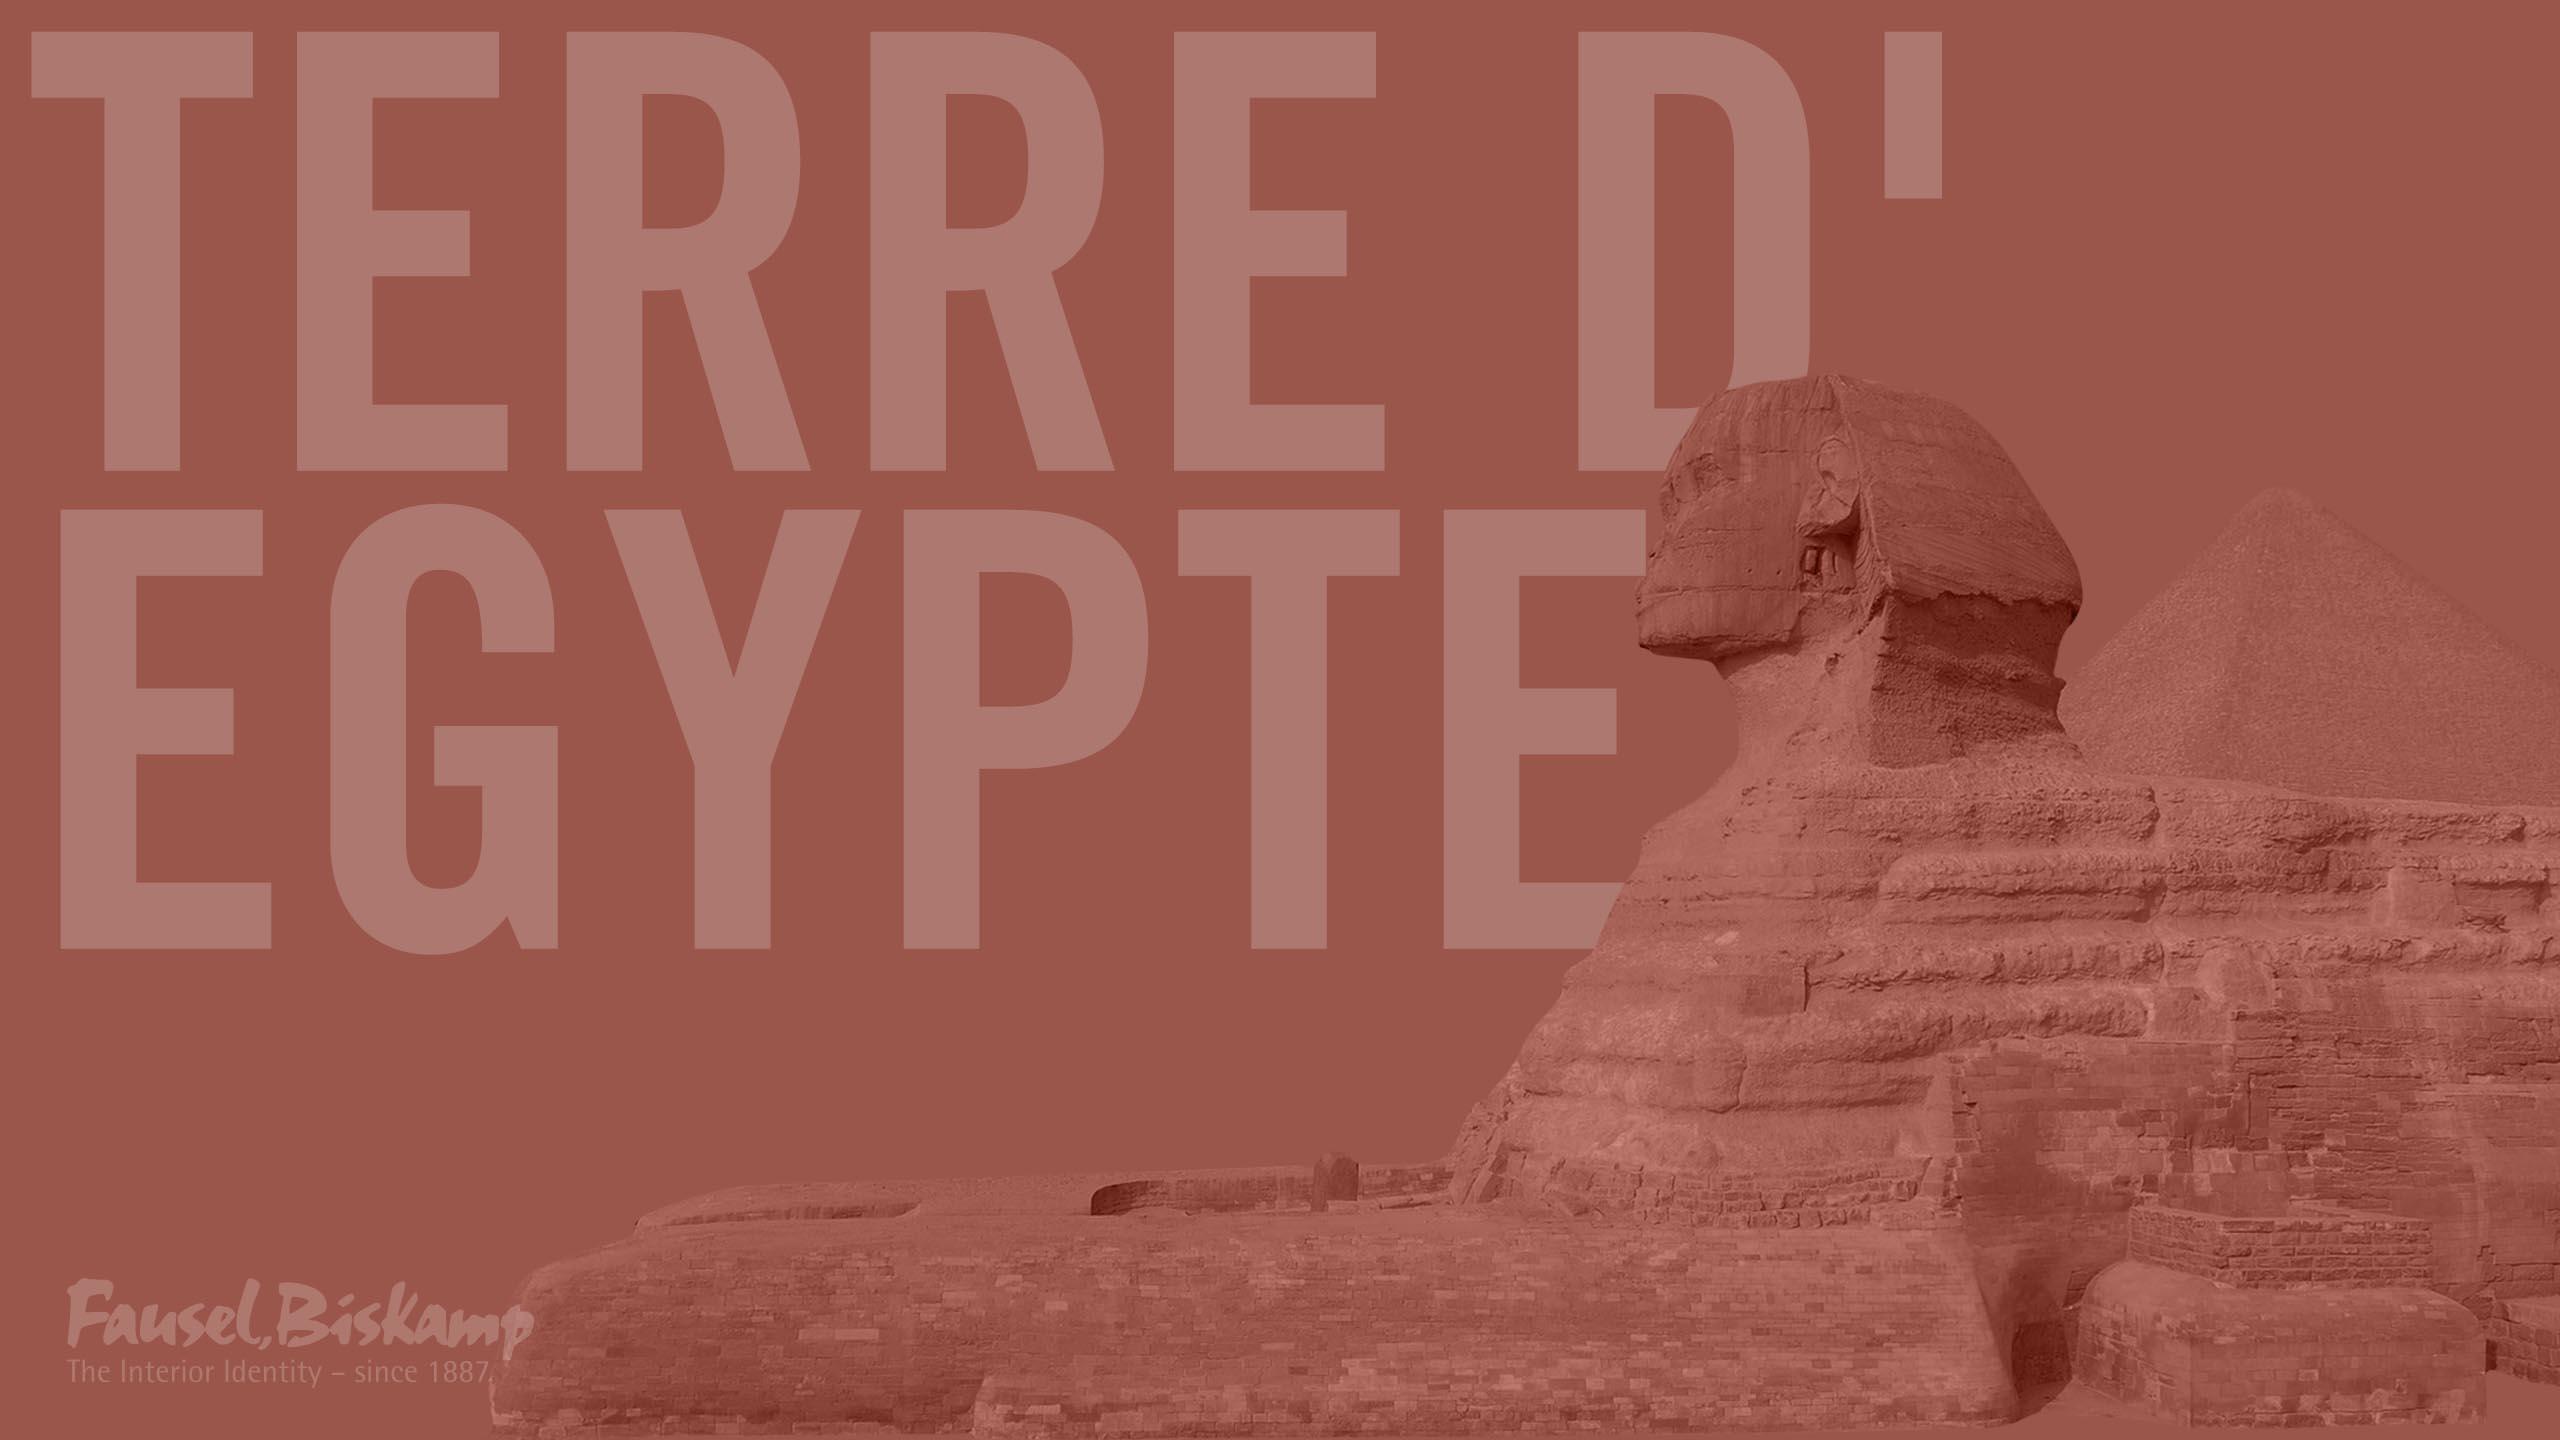 Terre d'Egypte (No. 247)